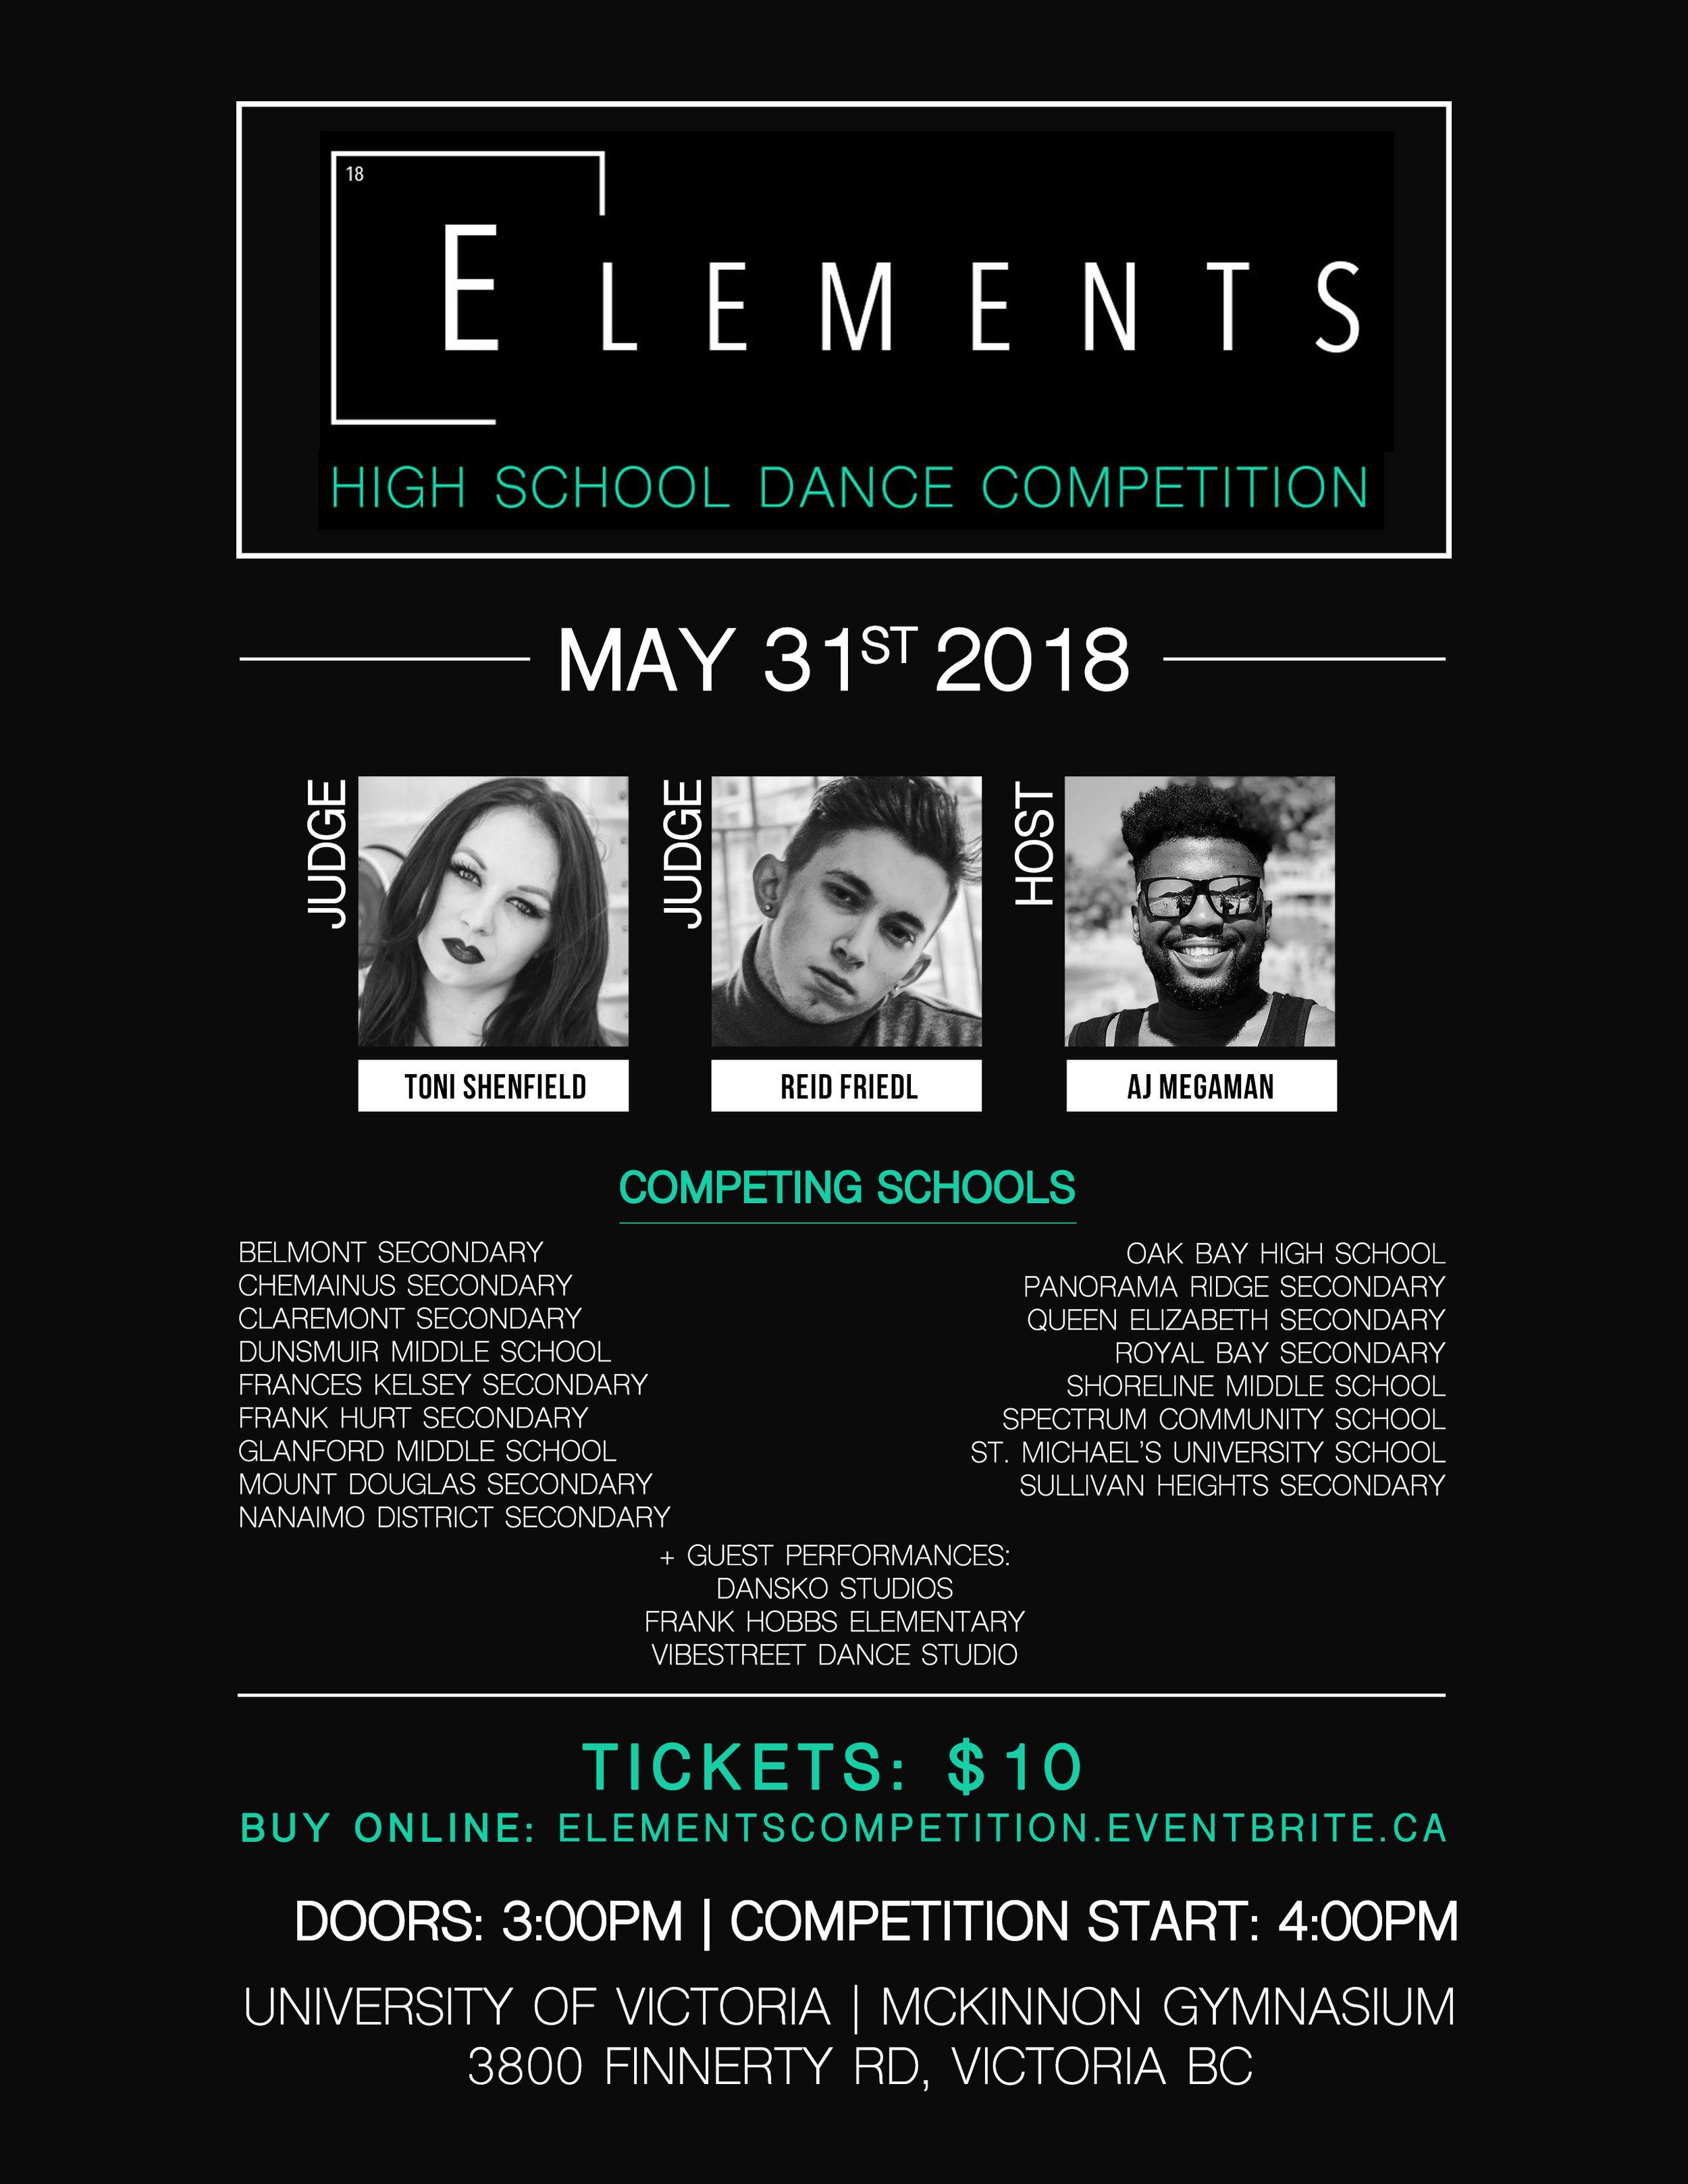 Elements Main Flyer 2018.jpg